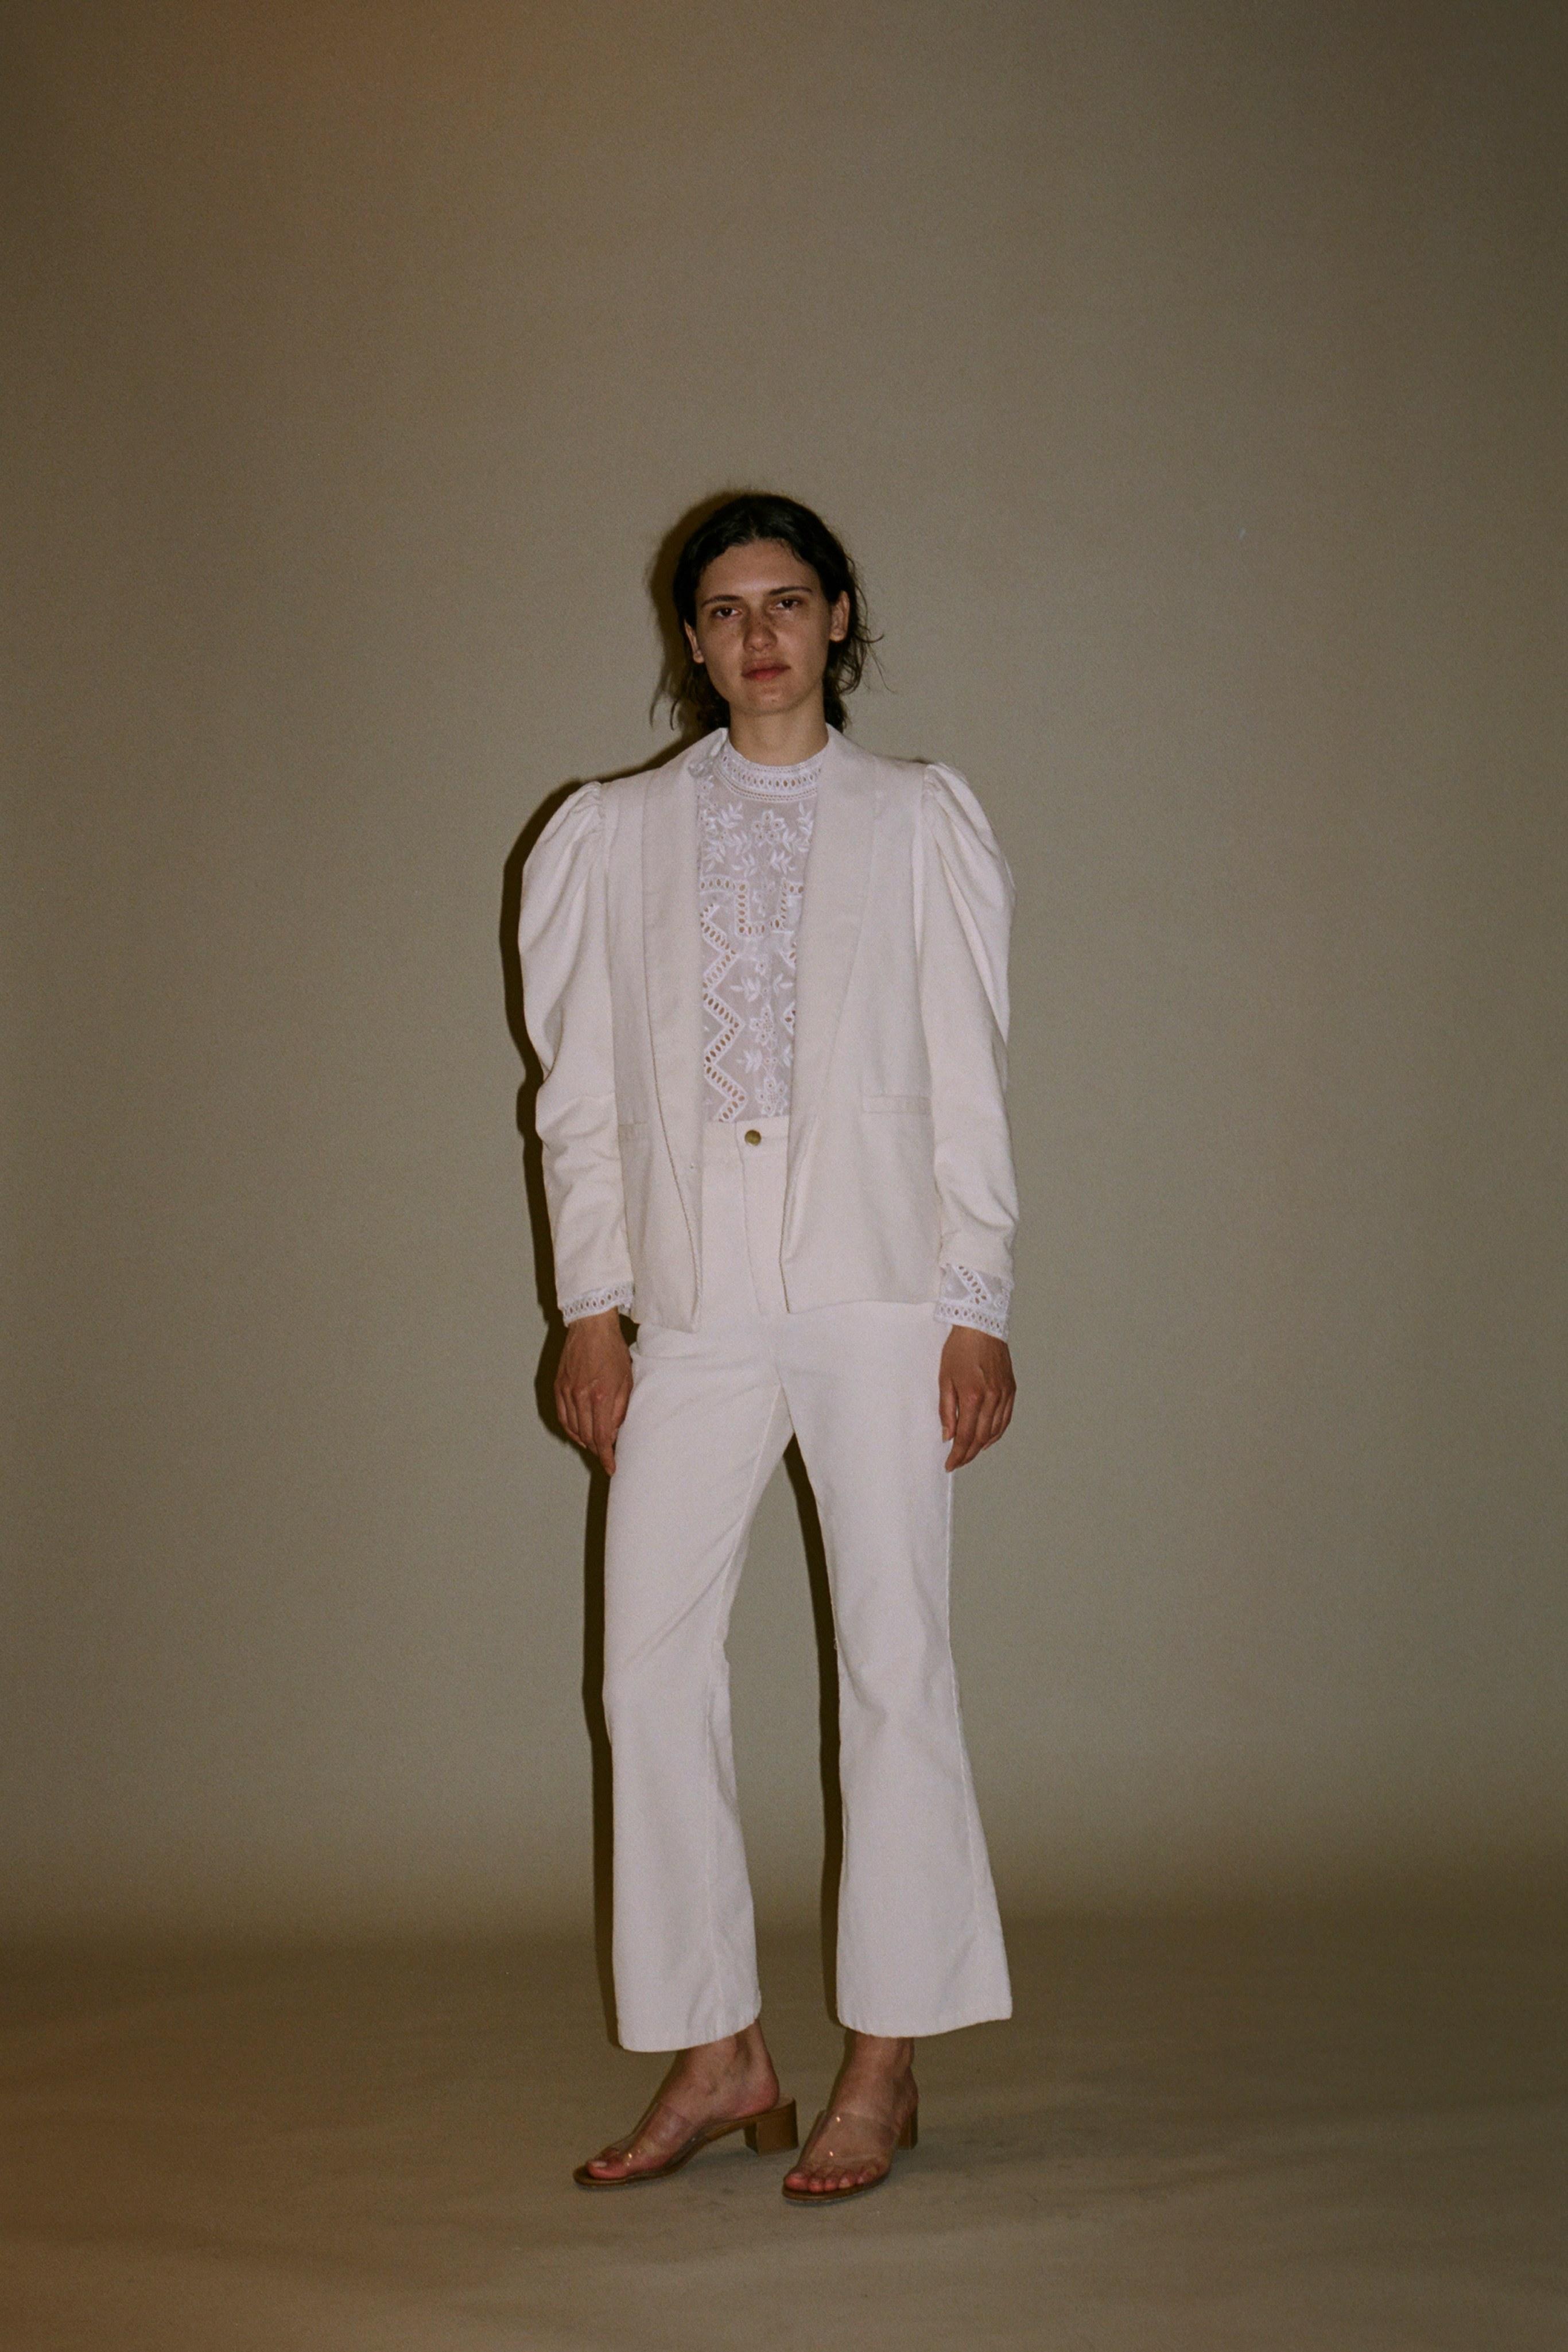 Zippy long sleeve blouse, Curtis corduroy blazer, Curtis corduroy Pants